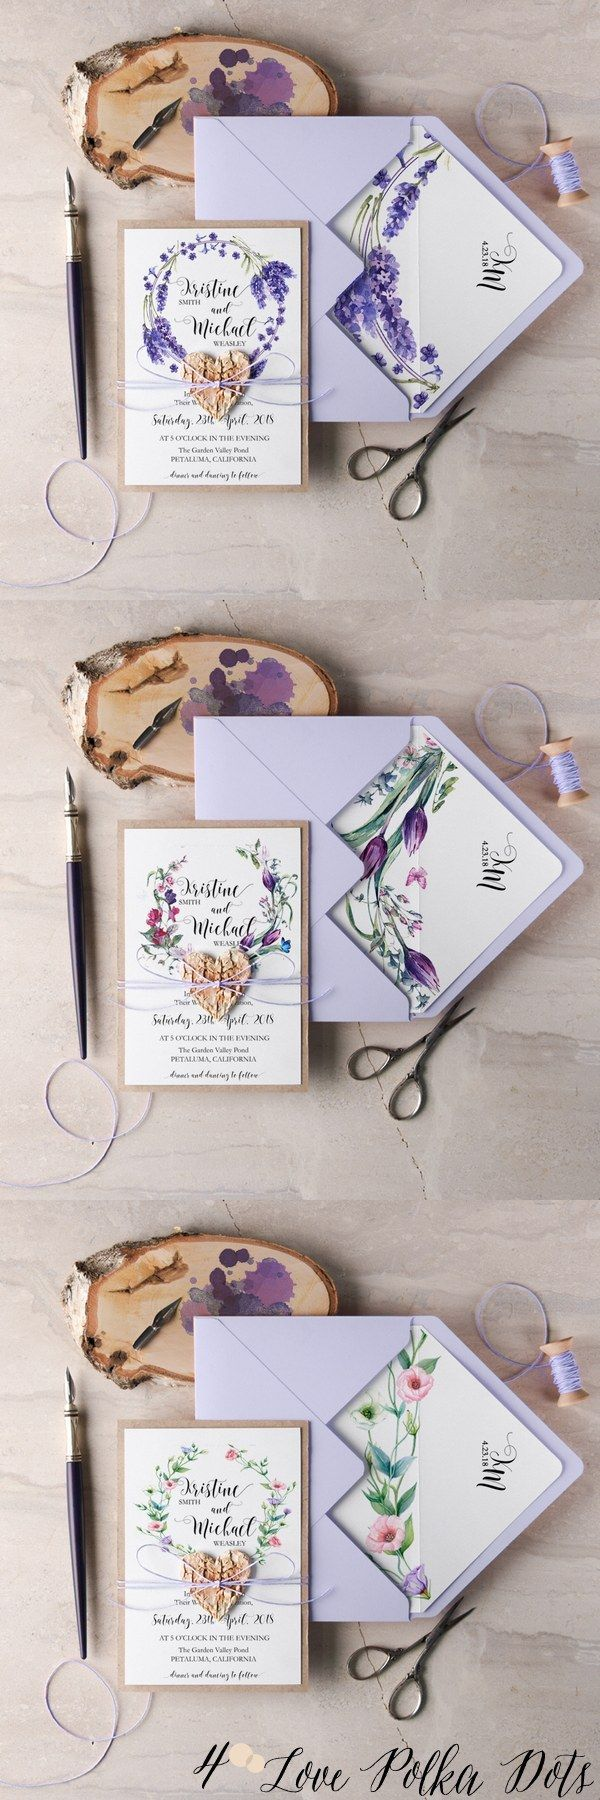 Purple watercolor wedding invitations #purplewedding #floralwedding #lilacwedding